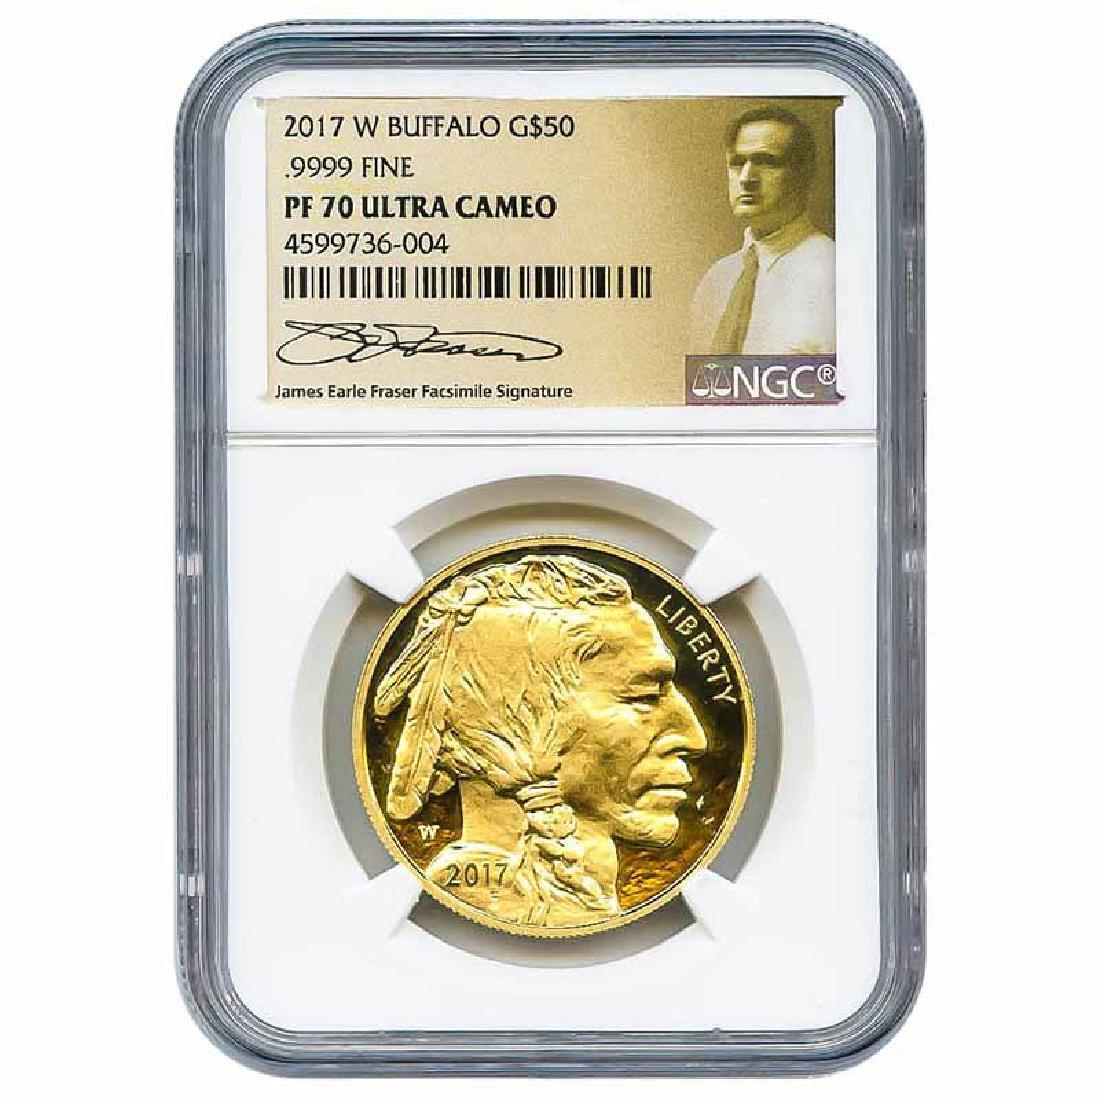 Certified Proof Buffalo Gold Coin 2017-W PF70 NGC James